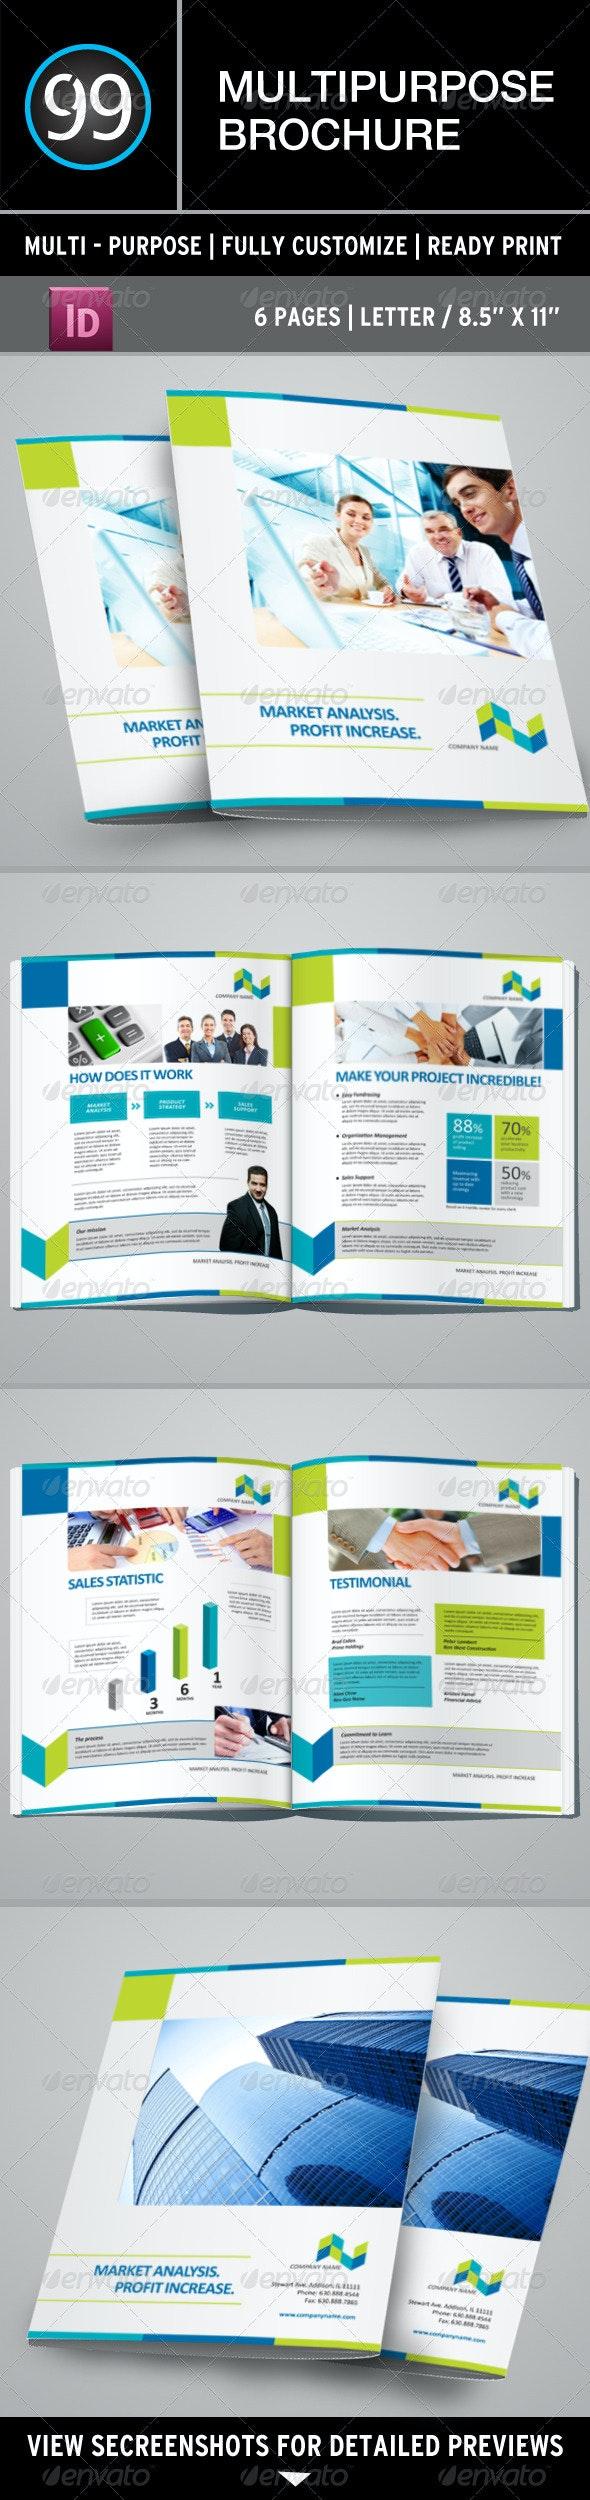 Multipurpose Brochure - Corporate Brochures